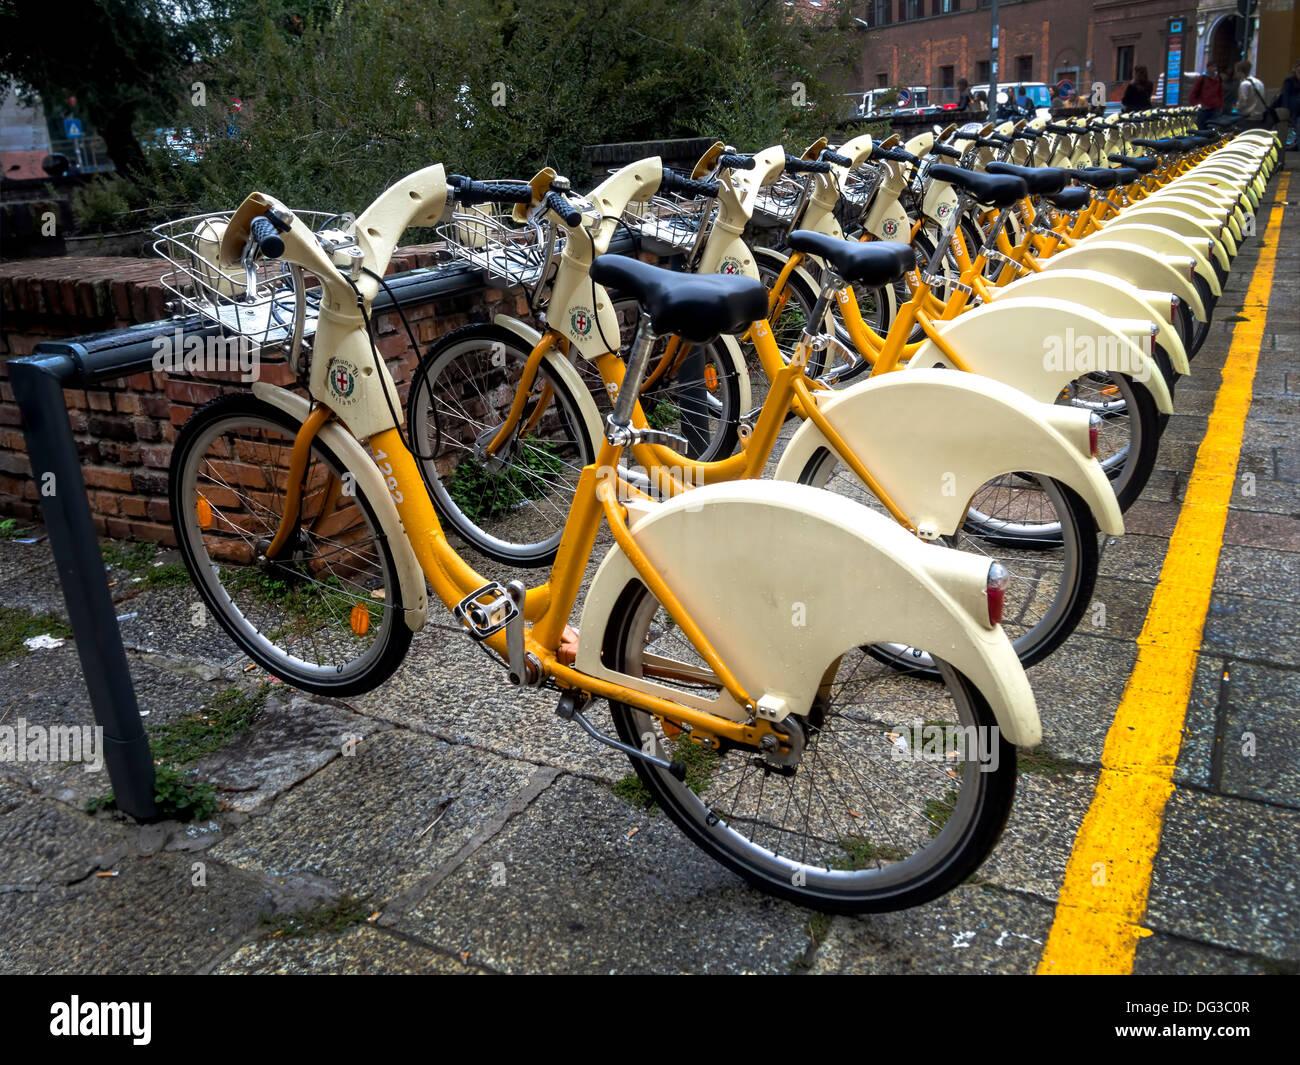 Public city bikes in Milano, Italy - Stock Image